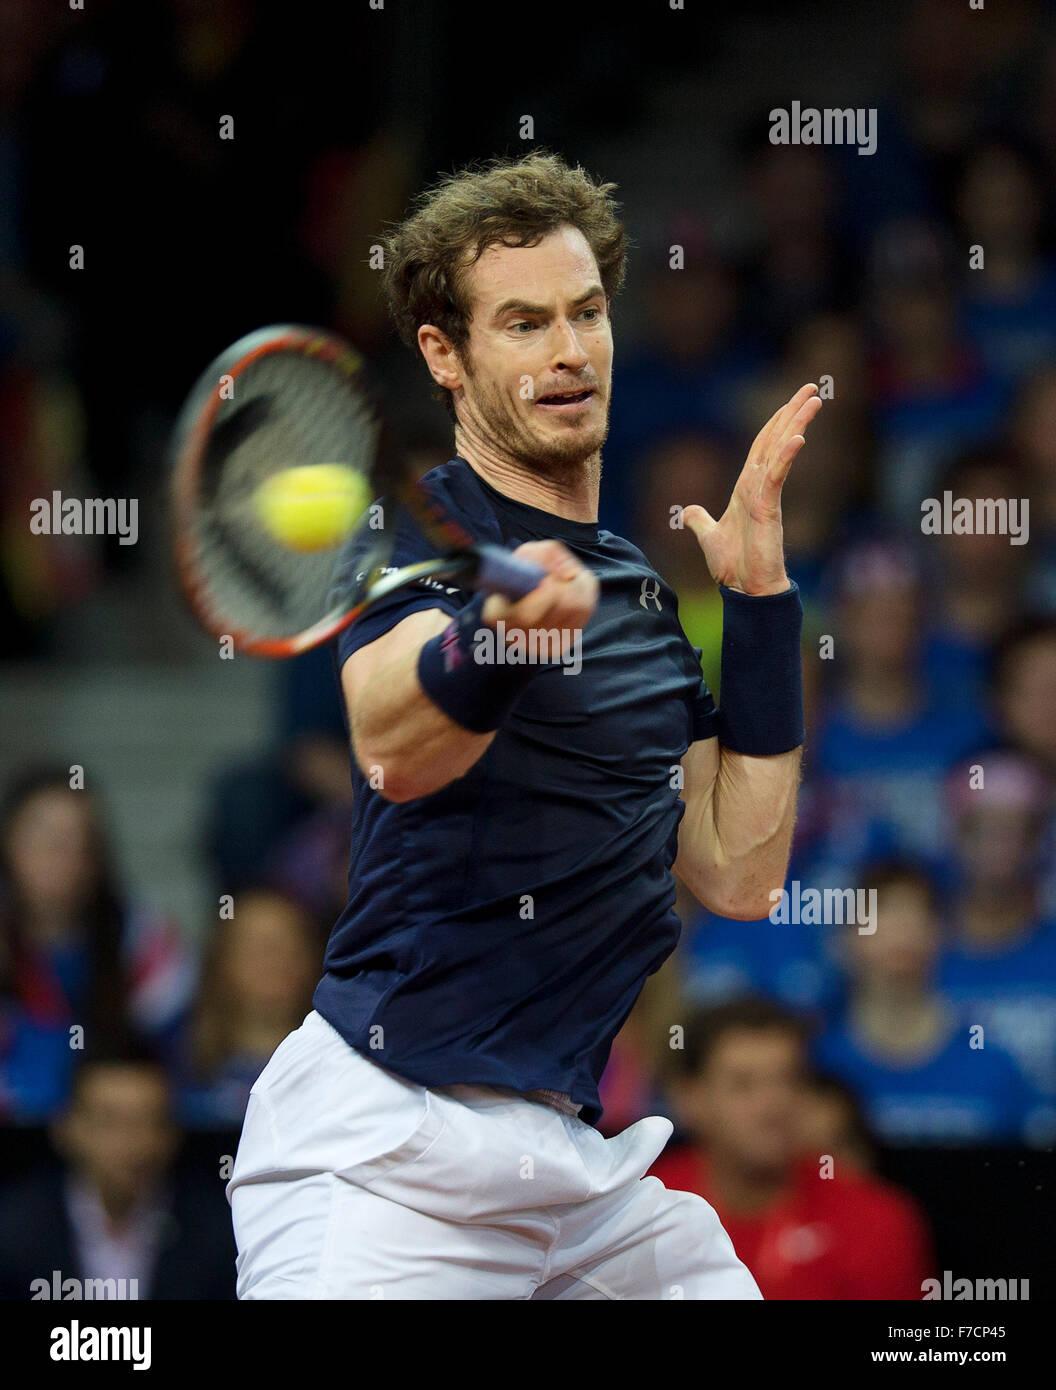 Gent, Belgium, November 29, 2015, Davis Cup Final, Belgium-Great Britain, day three, Andy Murray (GBR)  Photo: Tennisimages/Henk - Stock Image